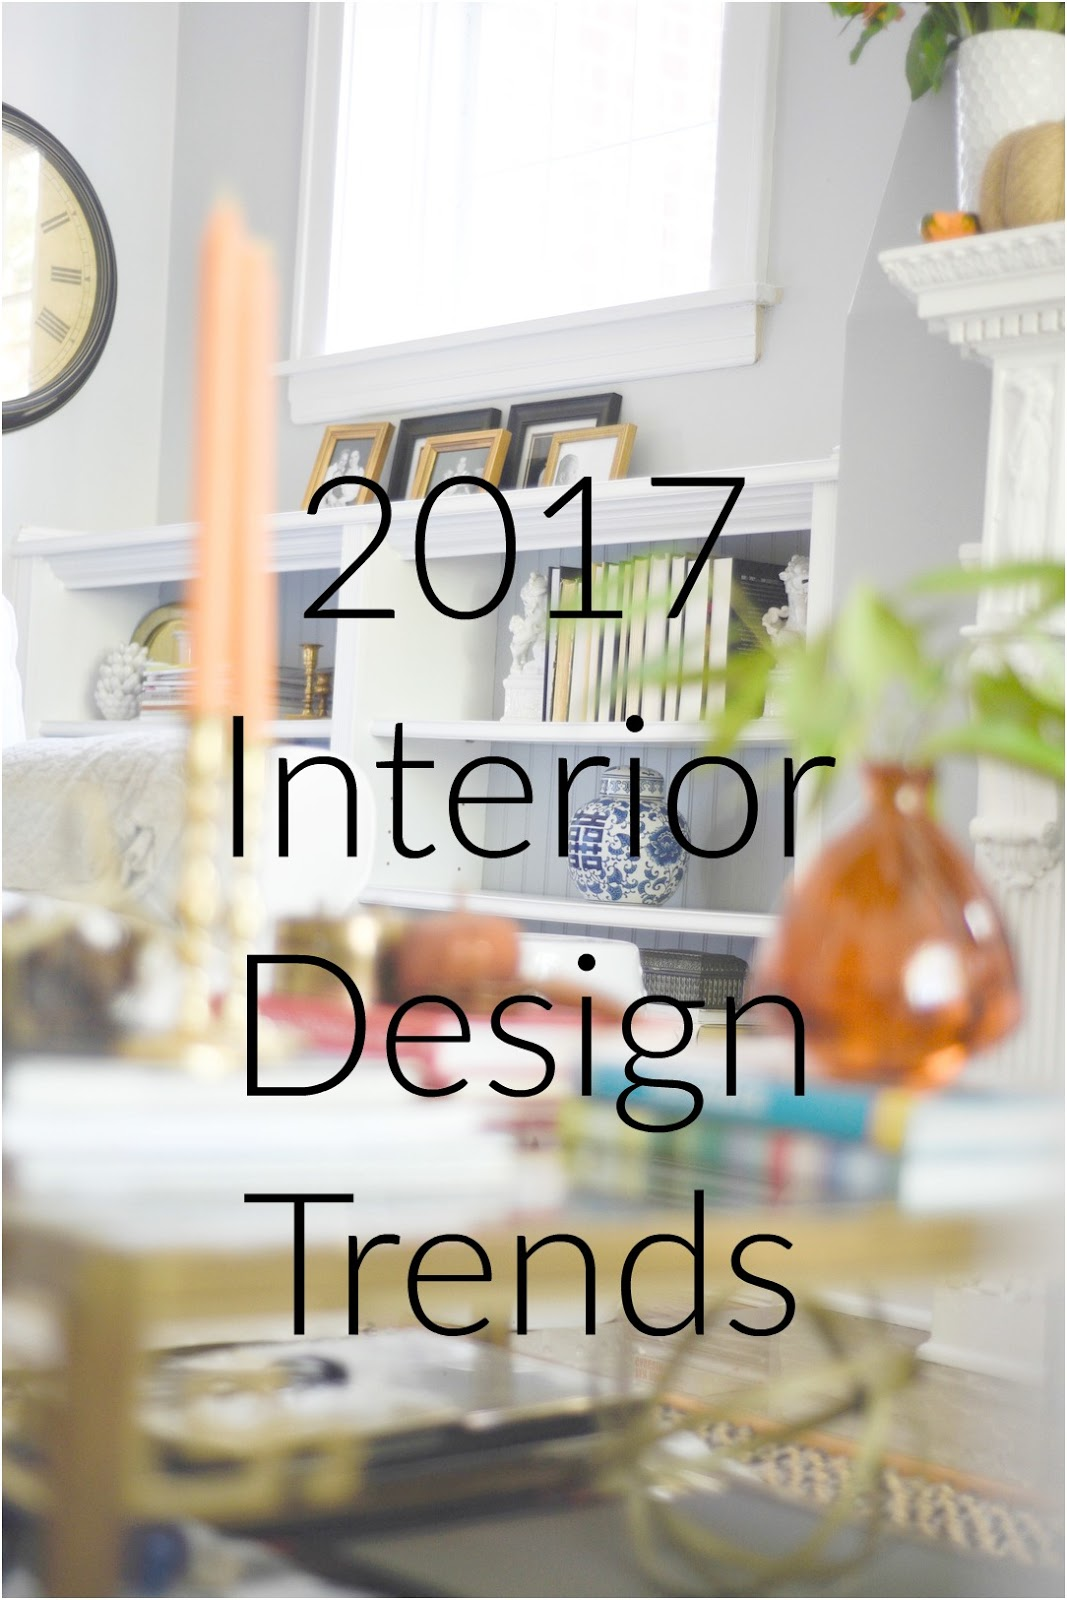 affordable interior design trends for 2017 www.homewithkeki.com